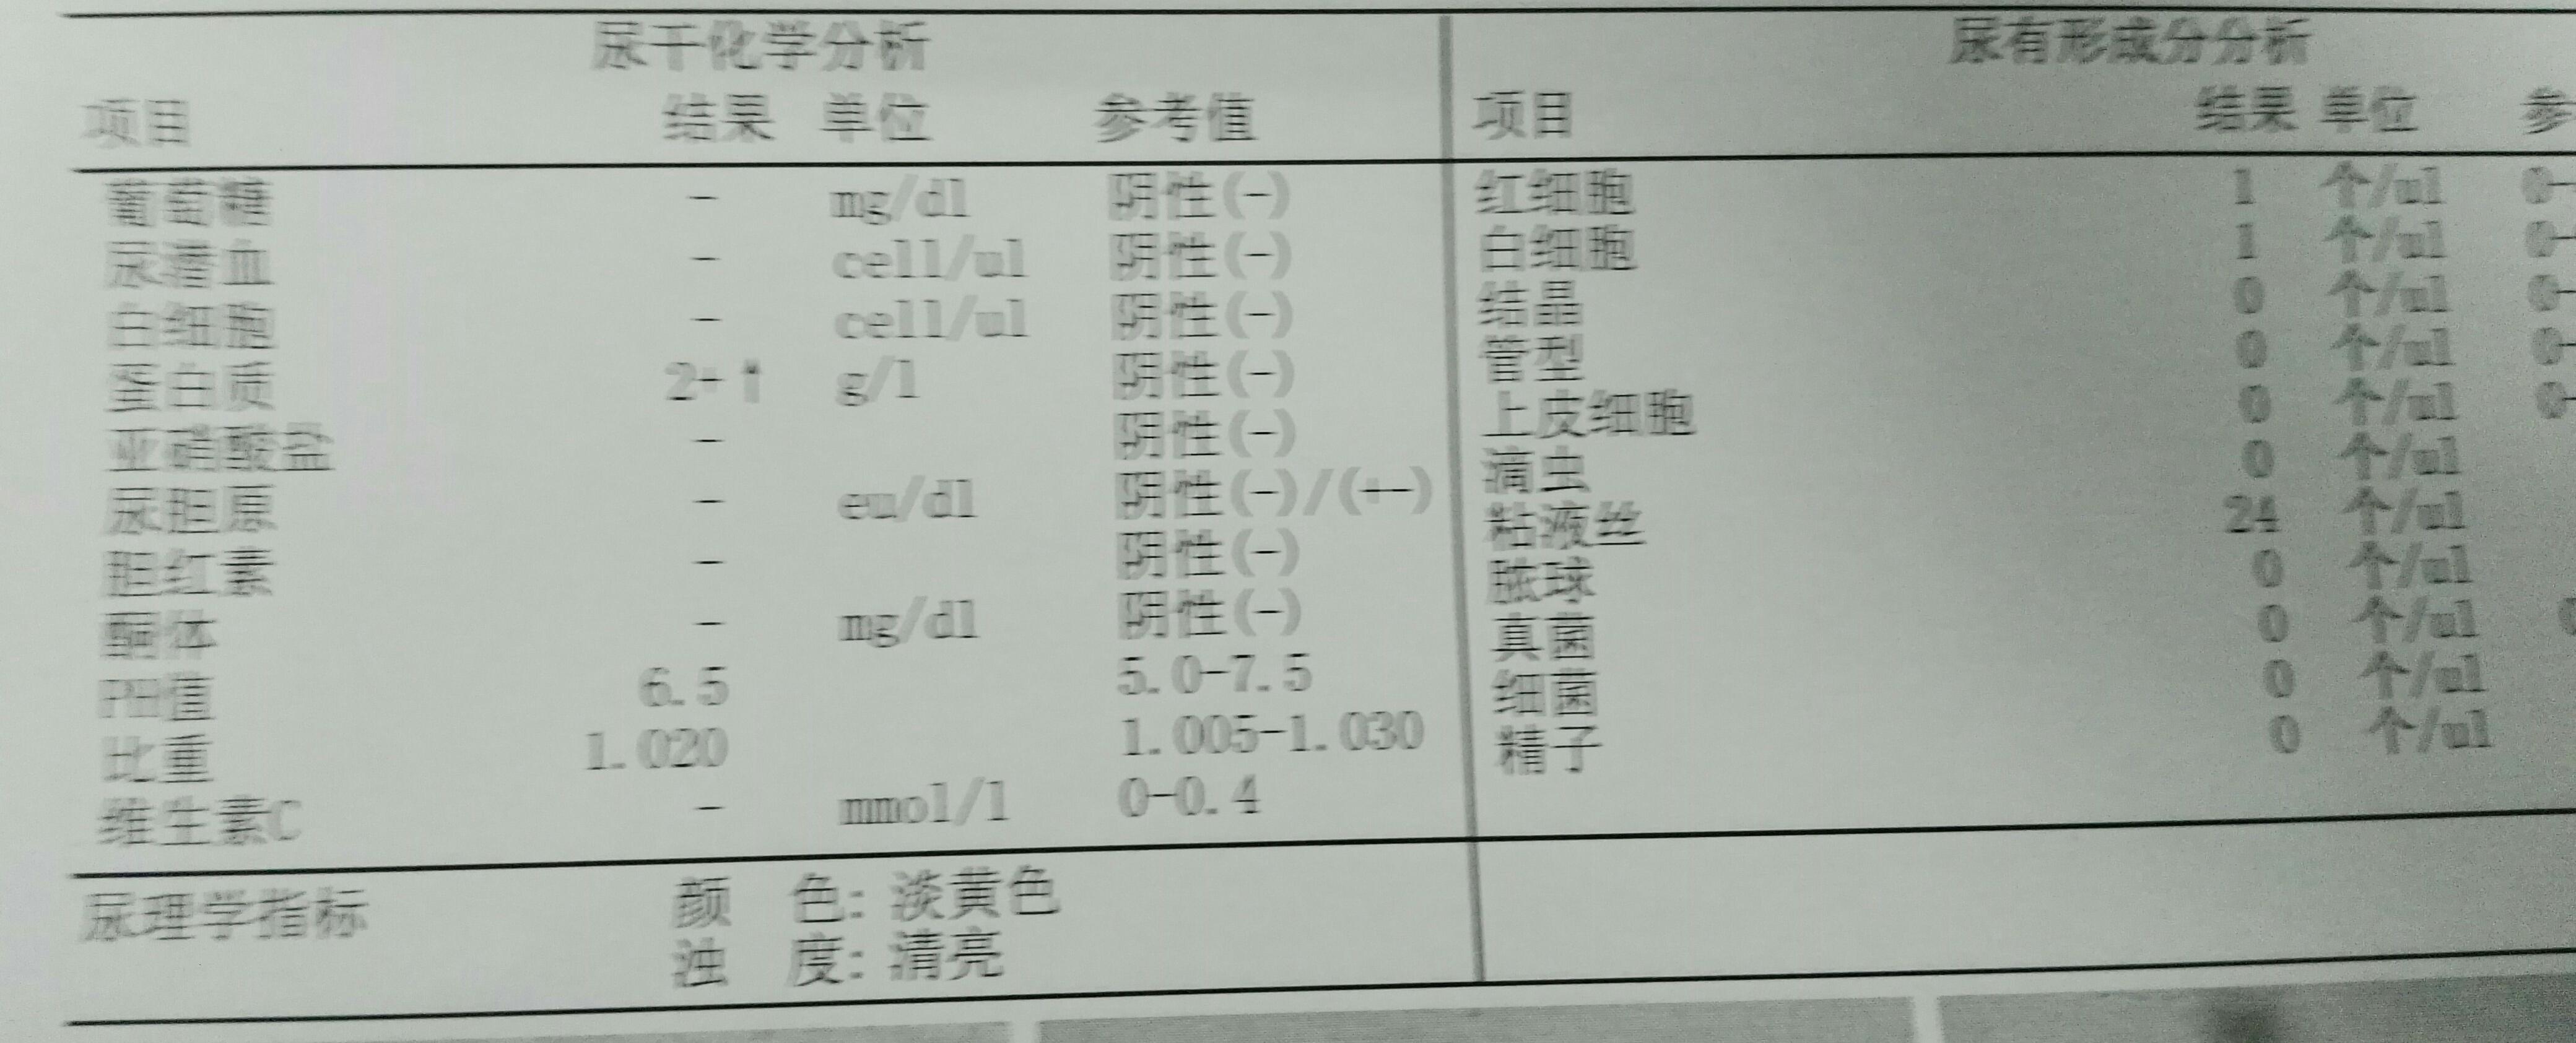 IMG_20171216_185951.jpg